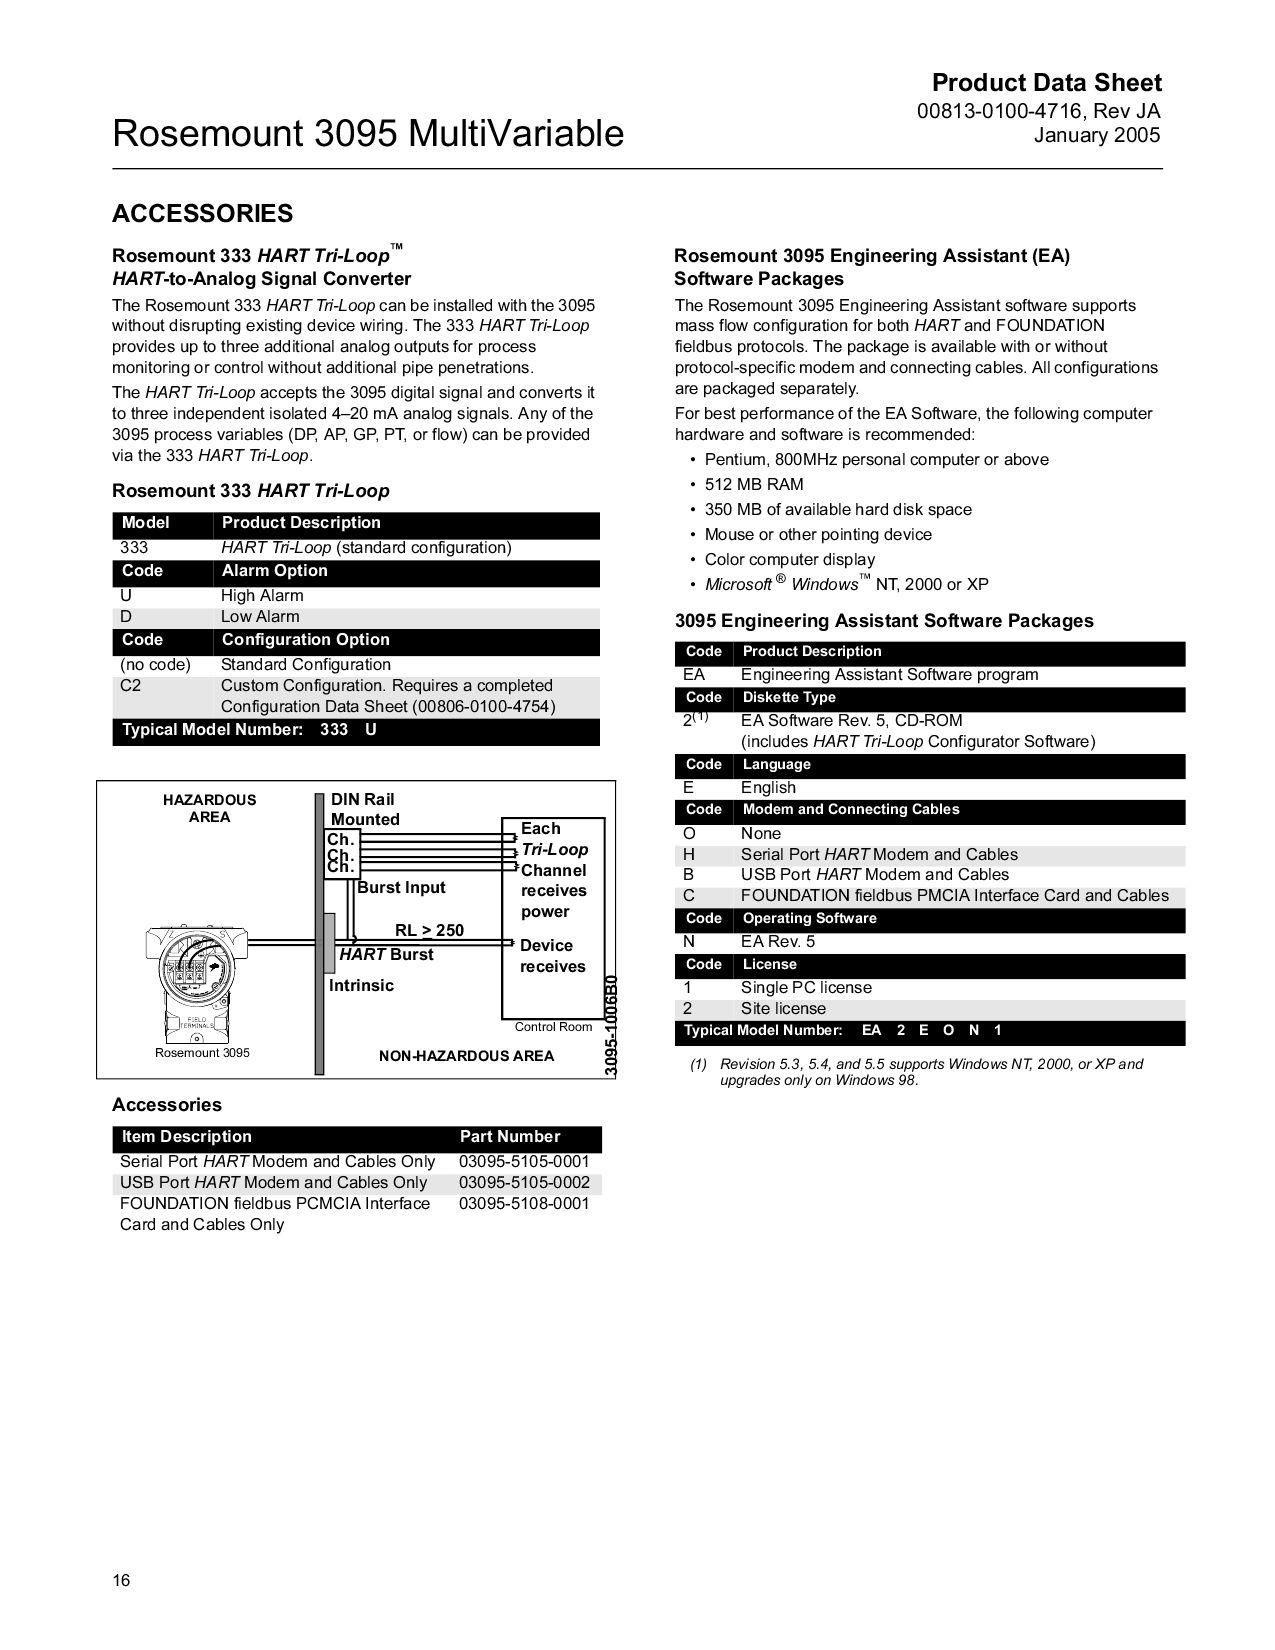 Rosemount 3095 MultiVariable™Mass Flow Transmitter